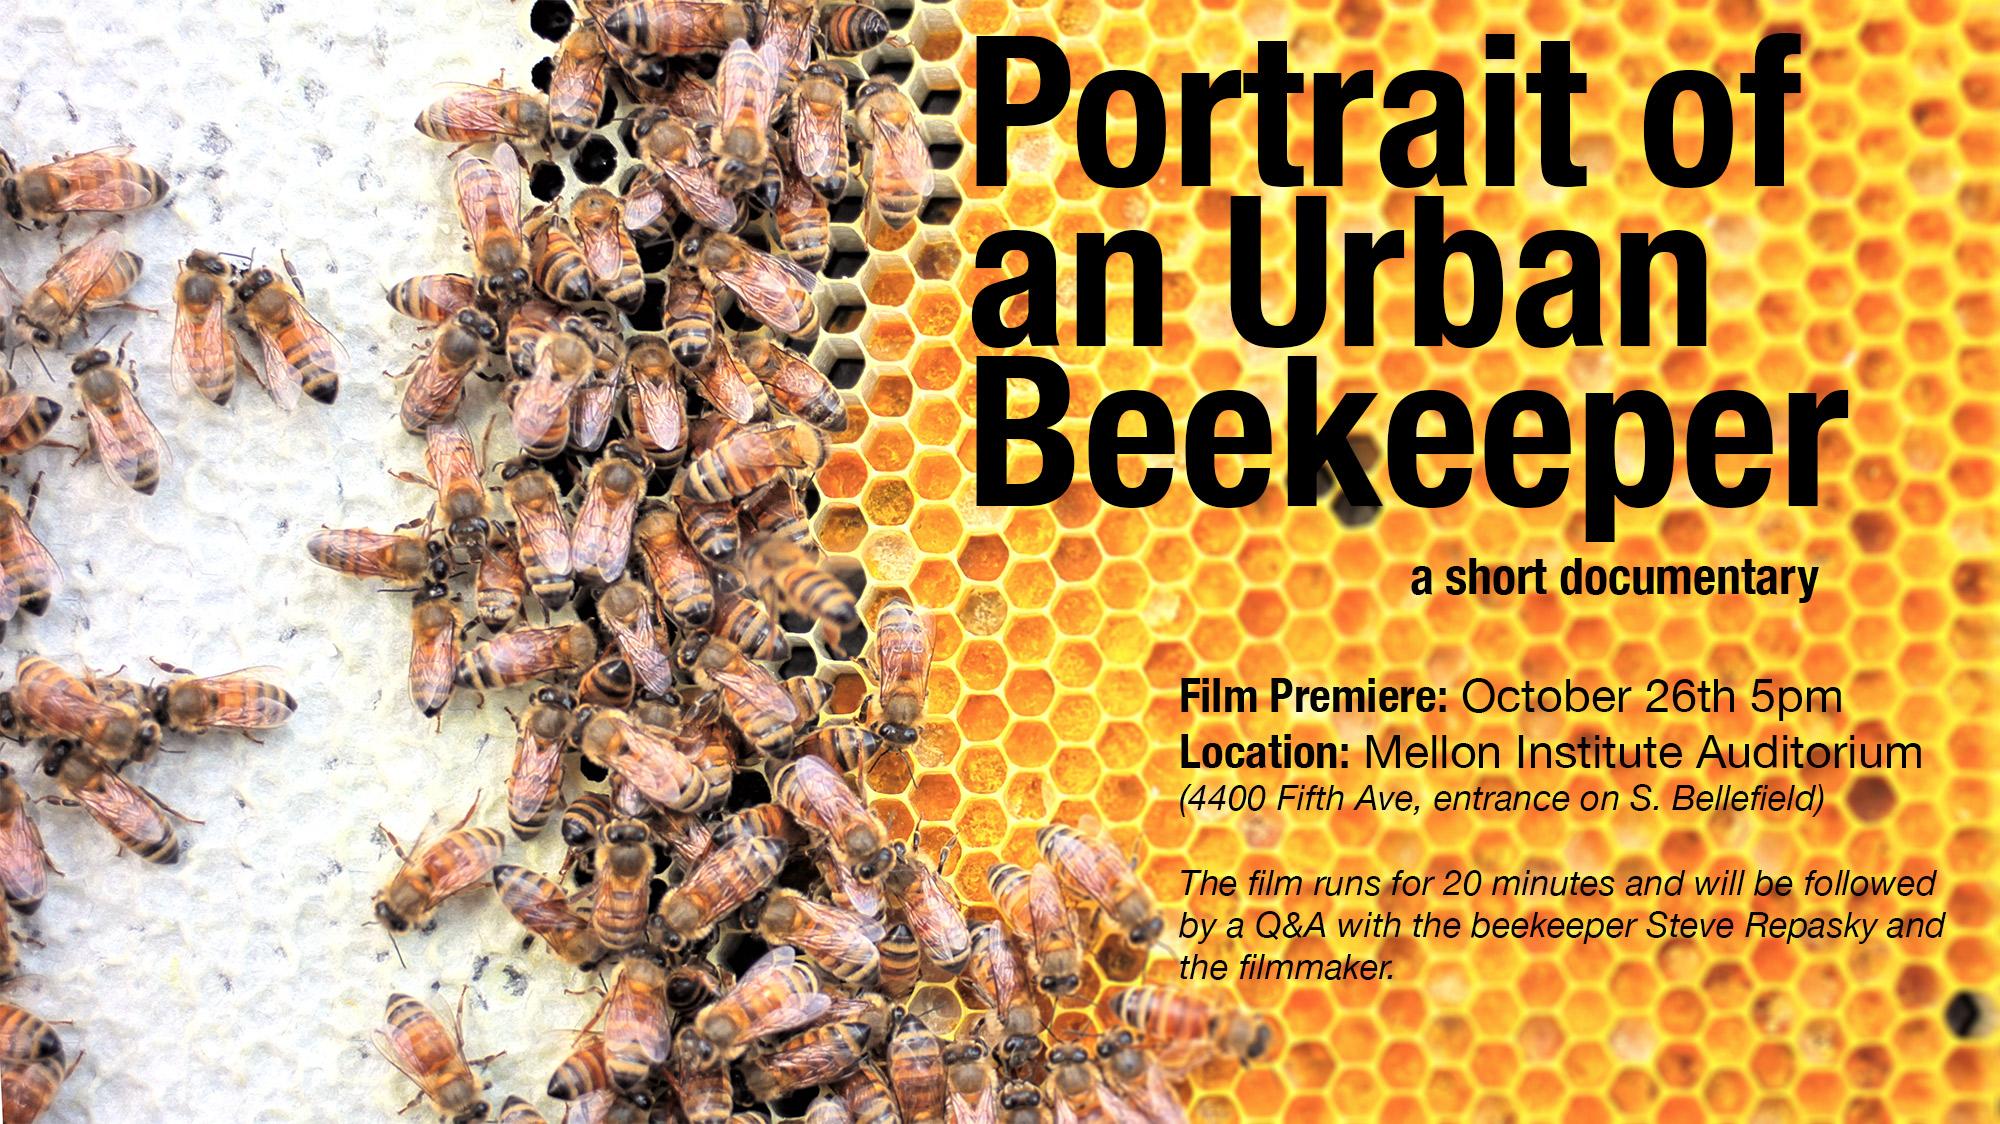 Potrait-of-an-Urban-Beekeeper-flyer.jpg